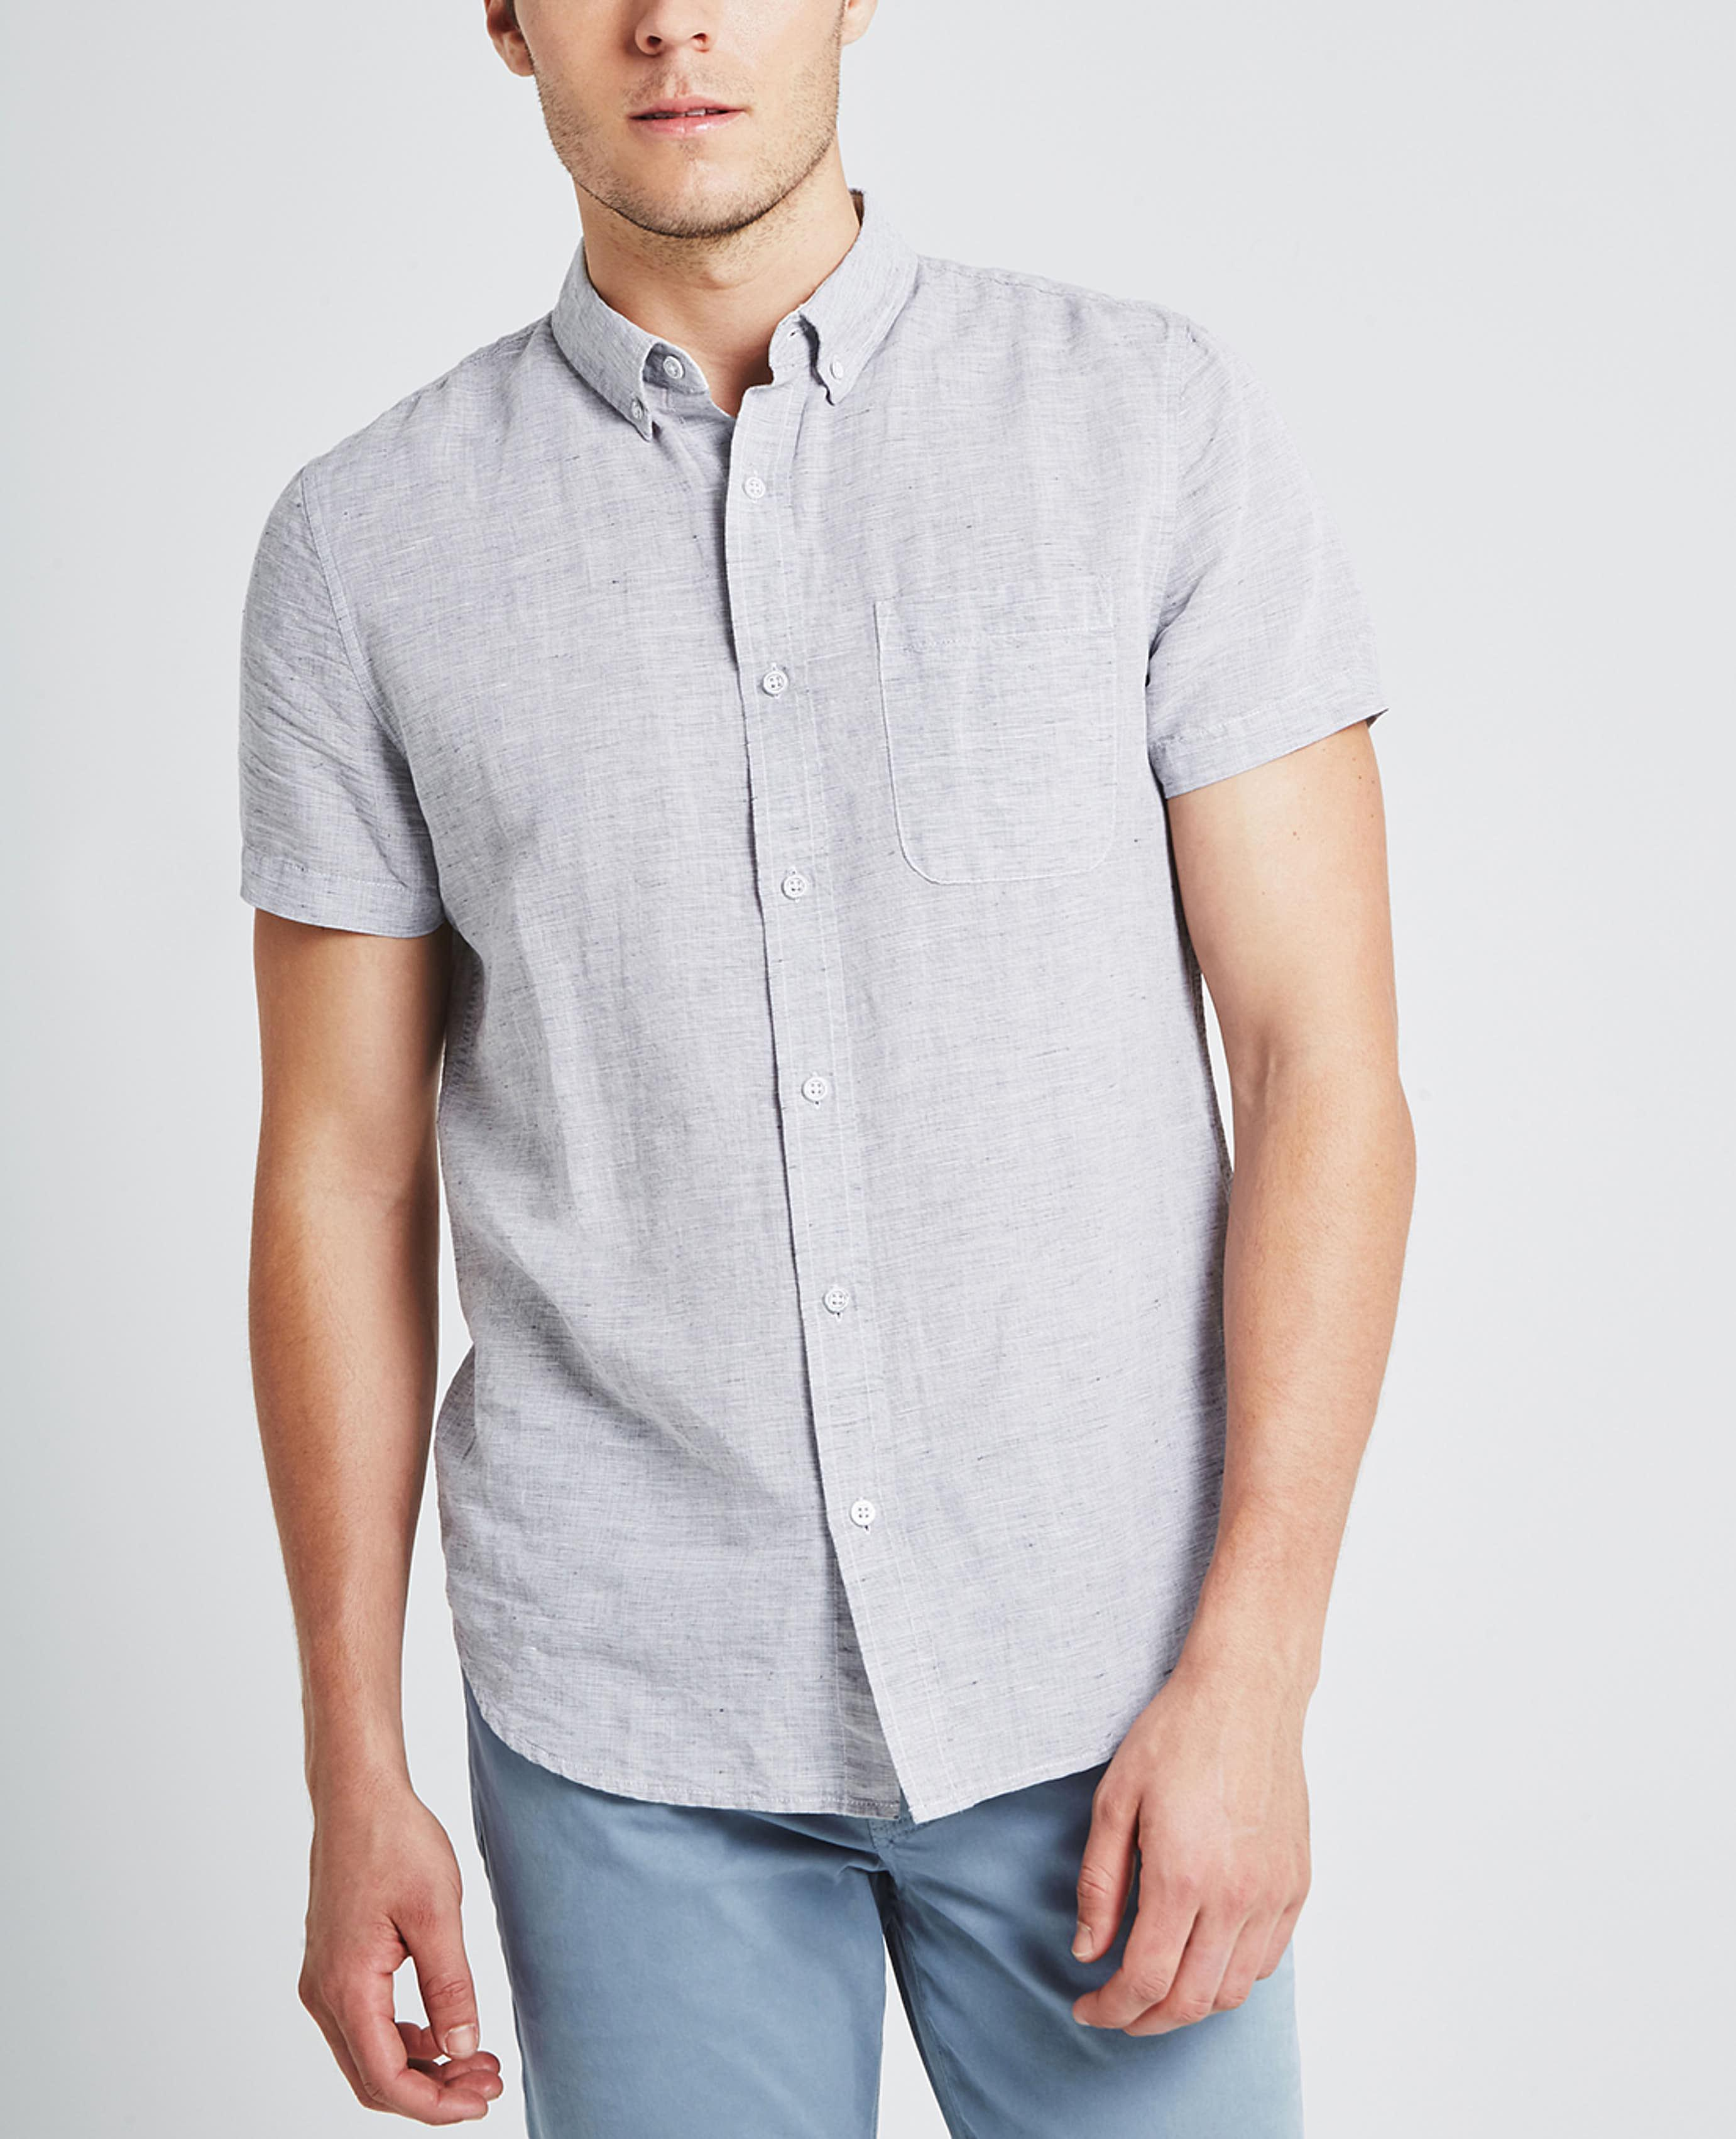 The Nash Shirt